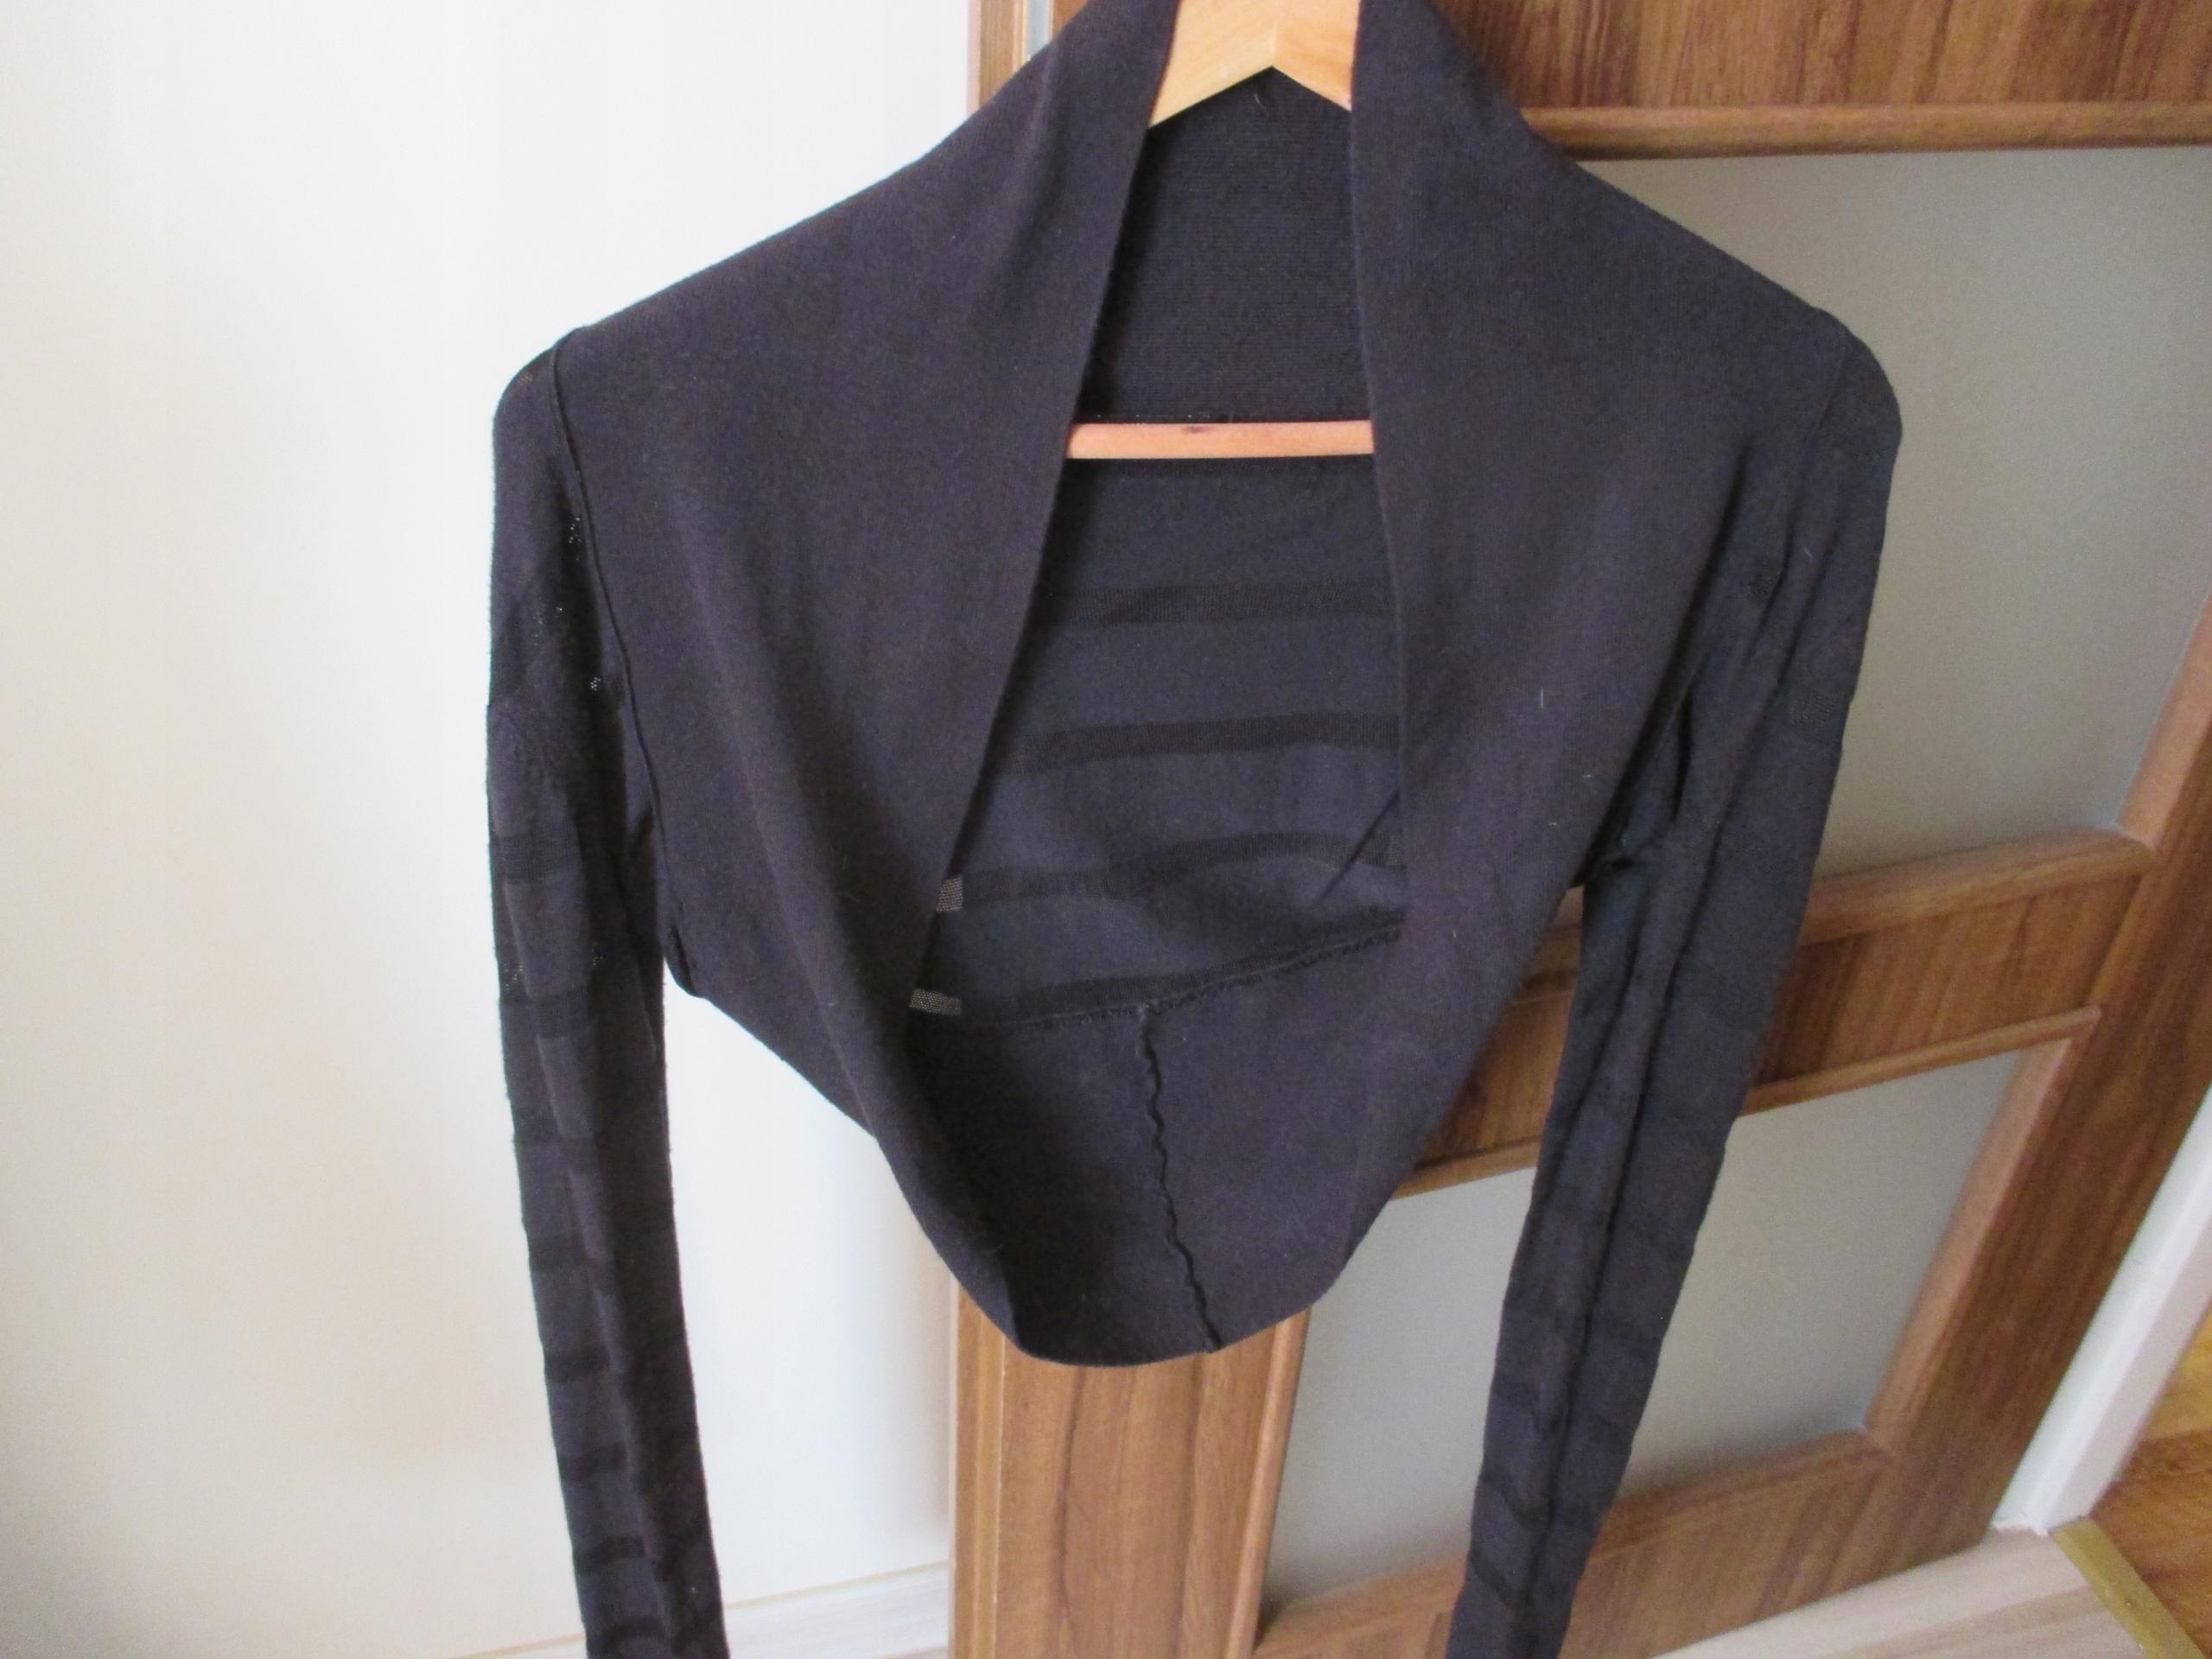 f7fdc2d162 Eleganckie czarne wieczorowe bolerko Jane Norman.M - 7623531725 ...